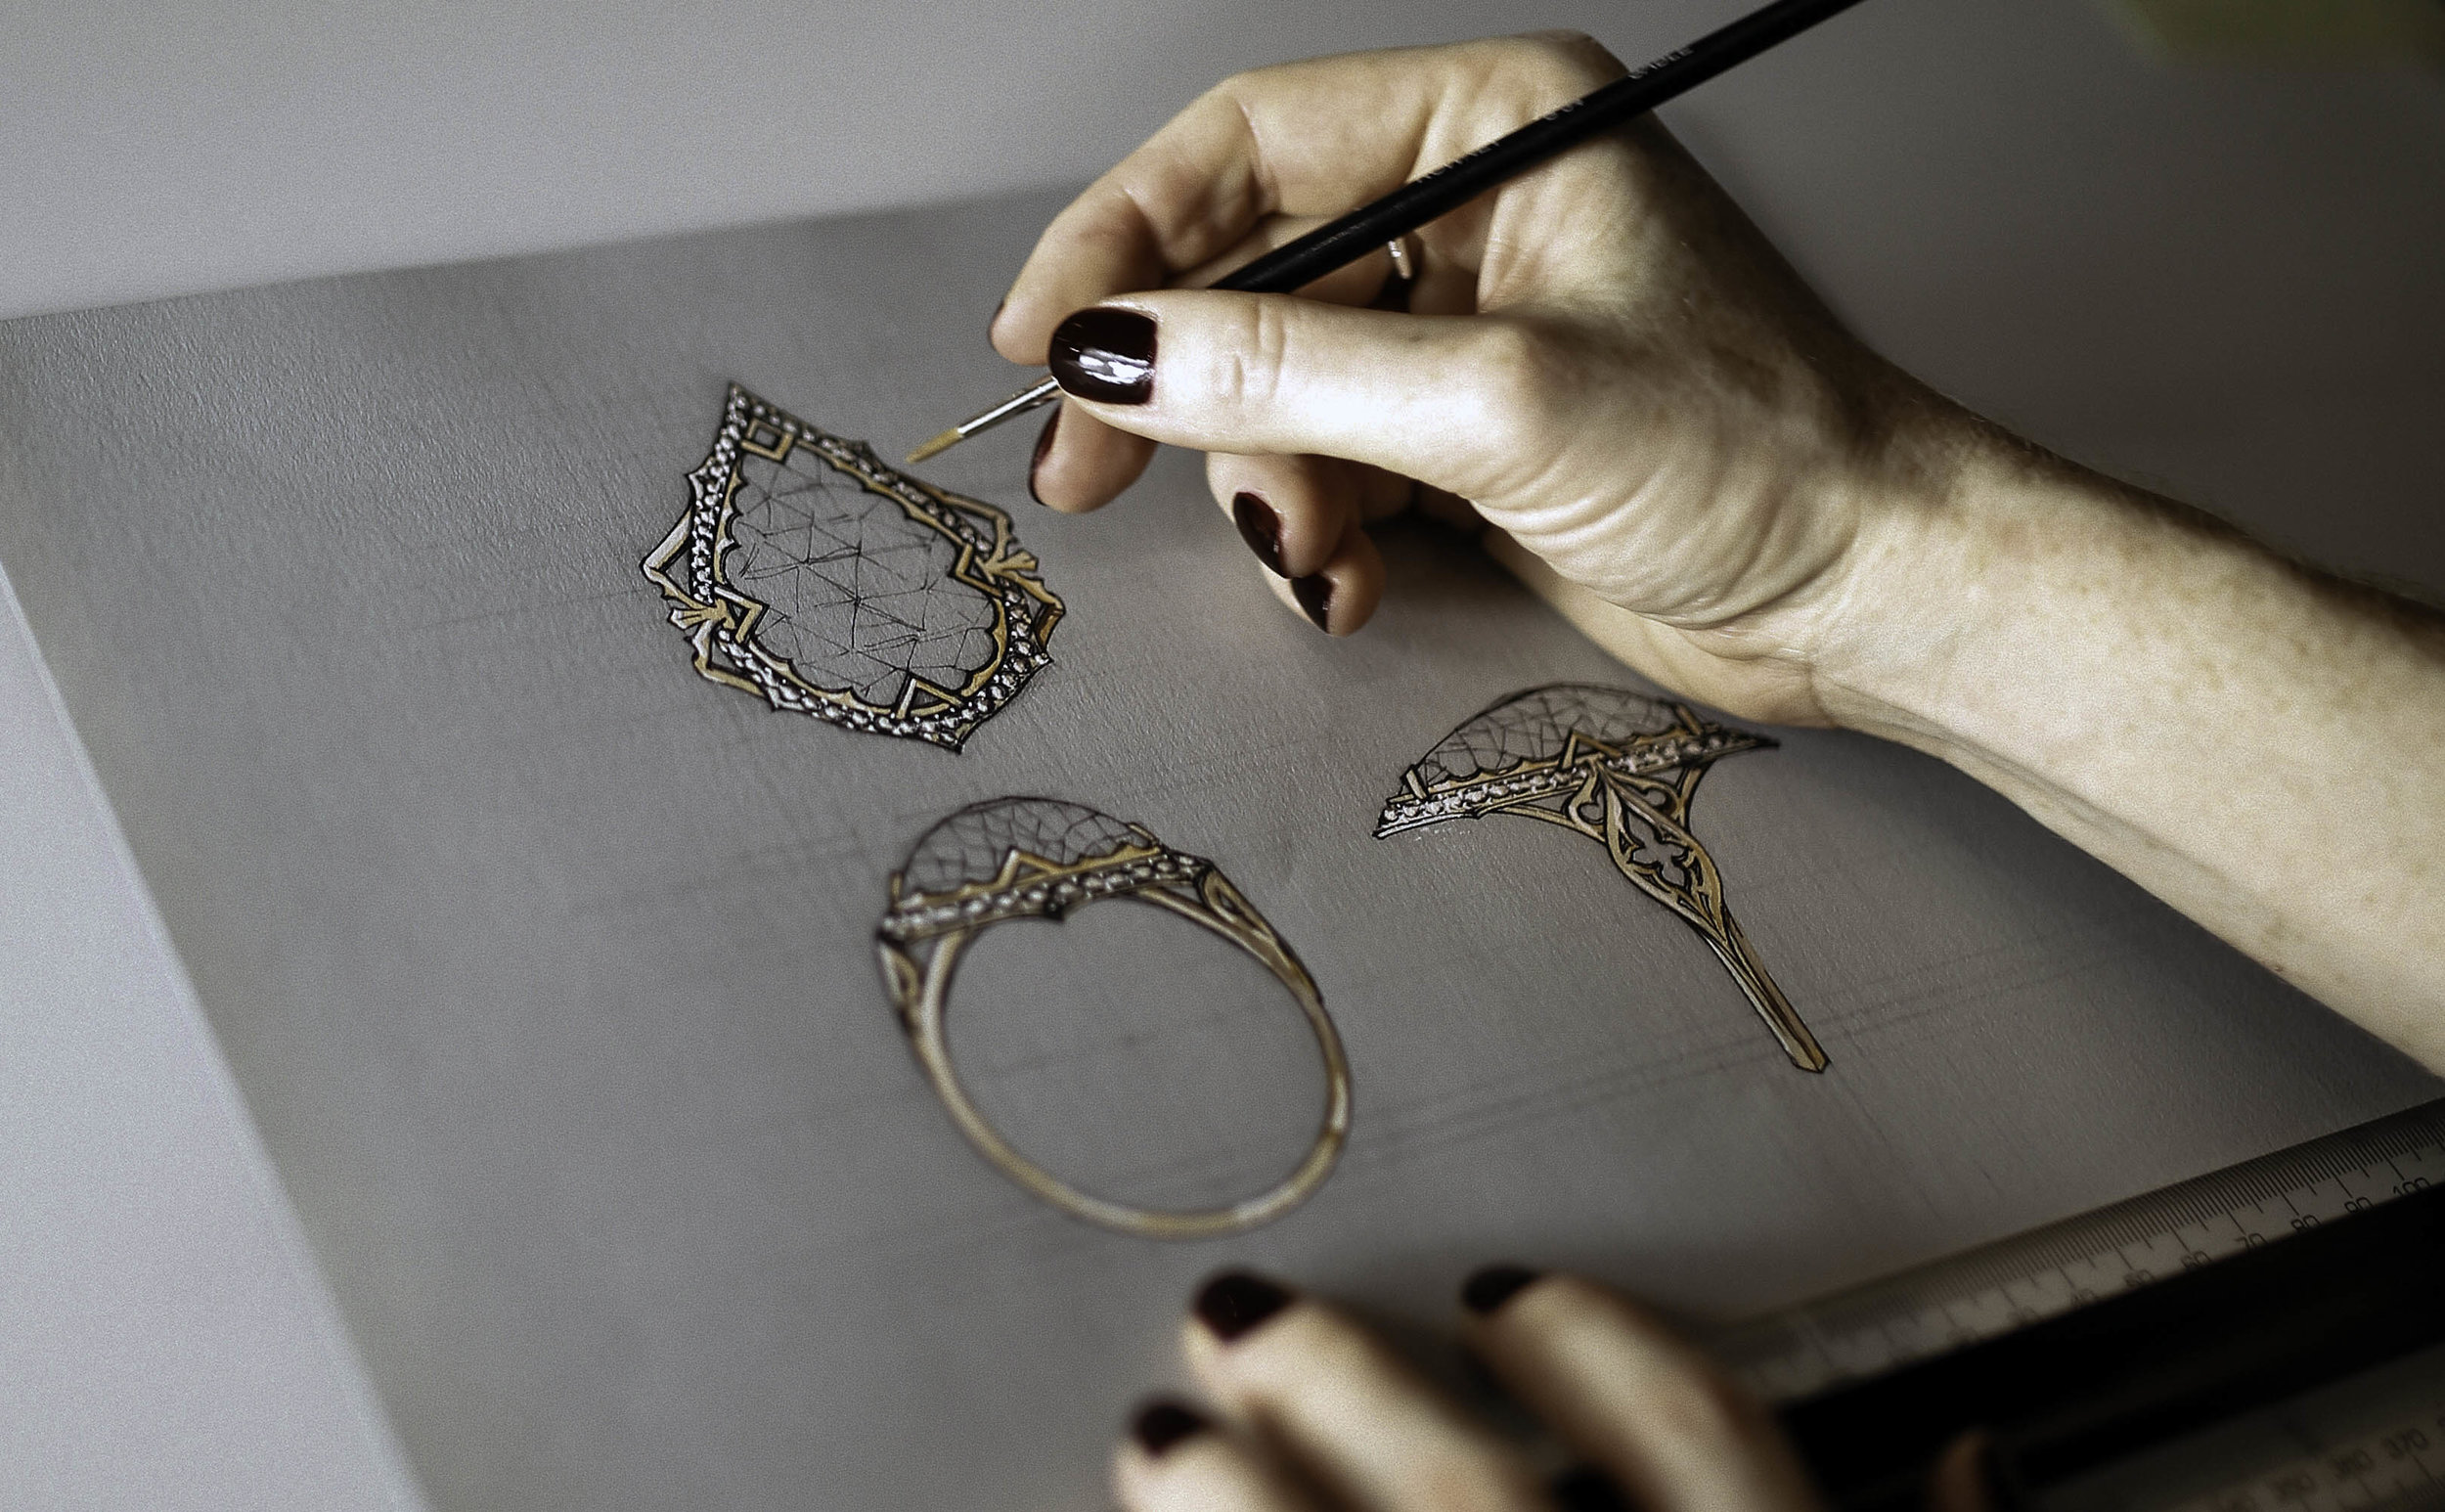 Professionally Framed Engagement ring illustration